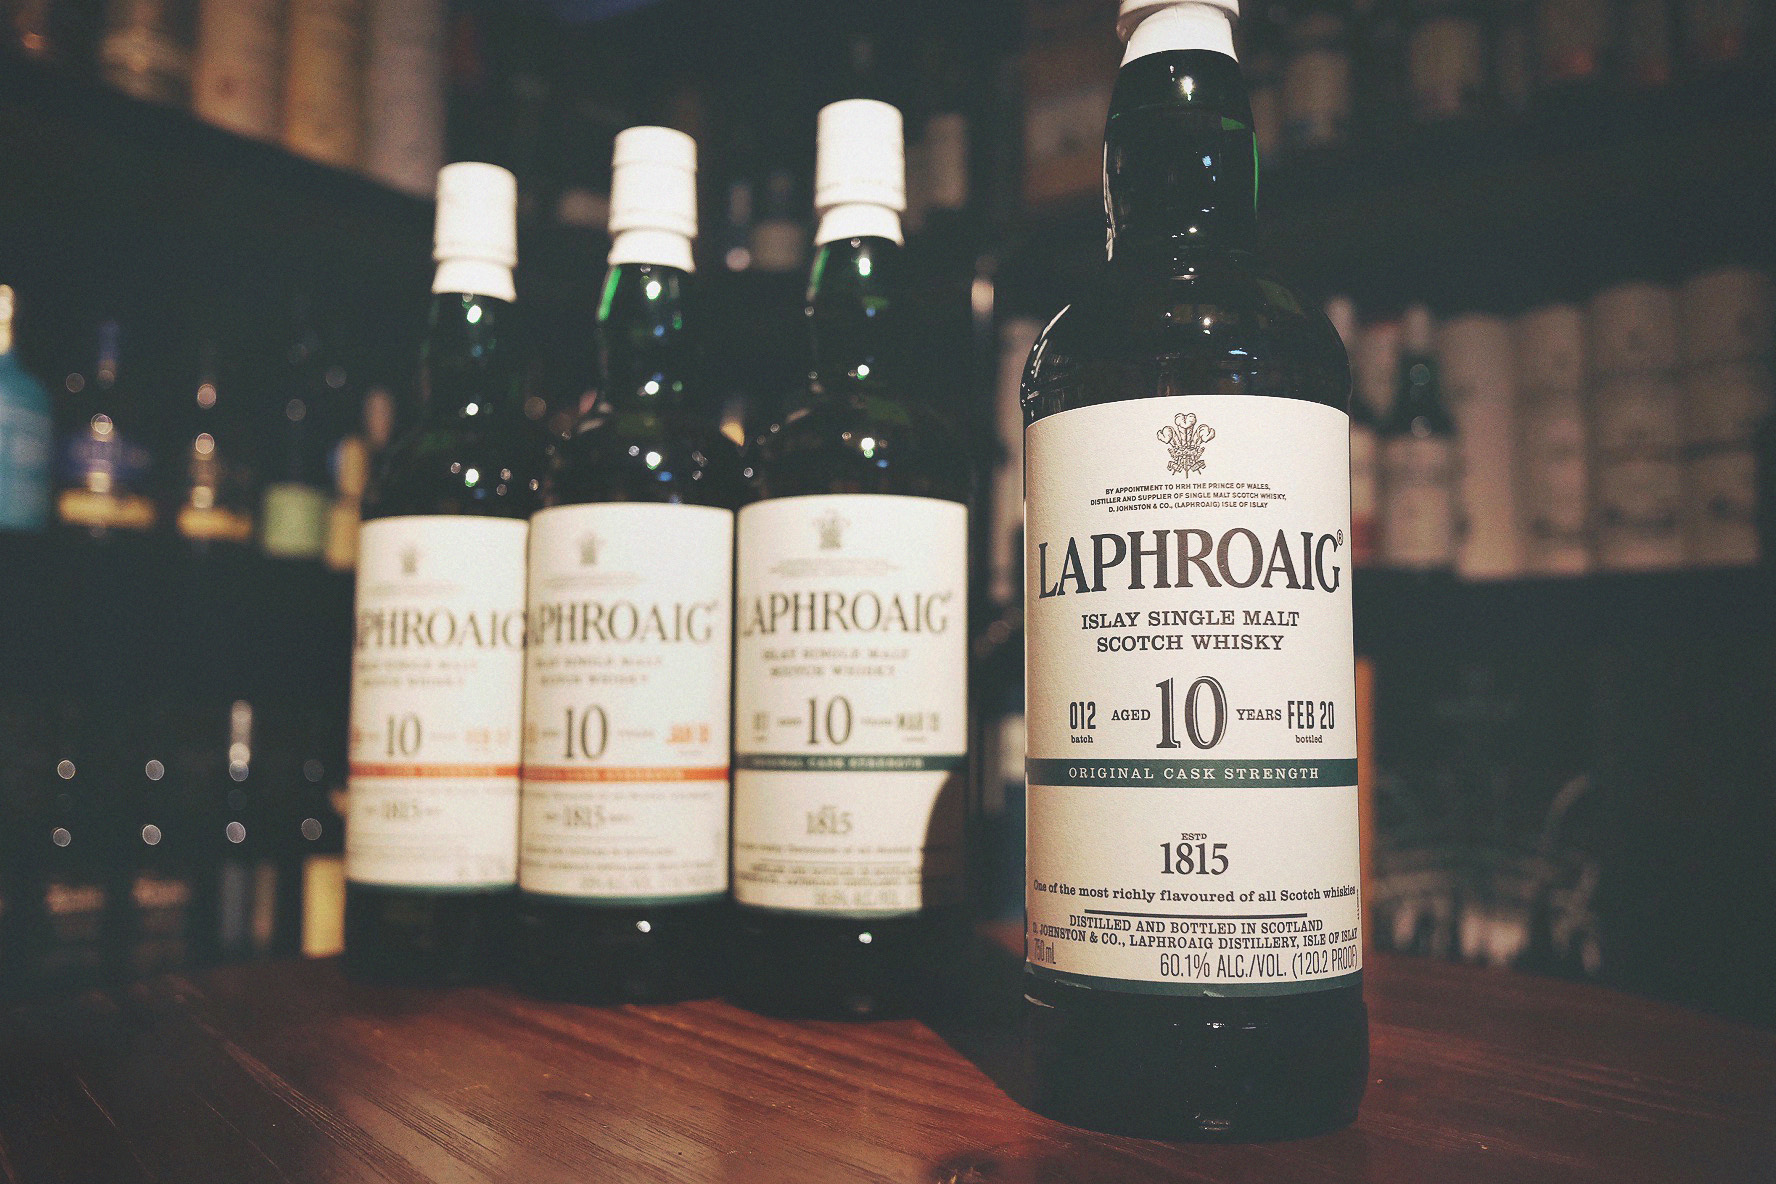 Laphroaig 10 Year Old Cask Strength Single Malt Whisky (Batch #012)